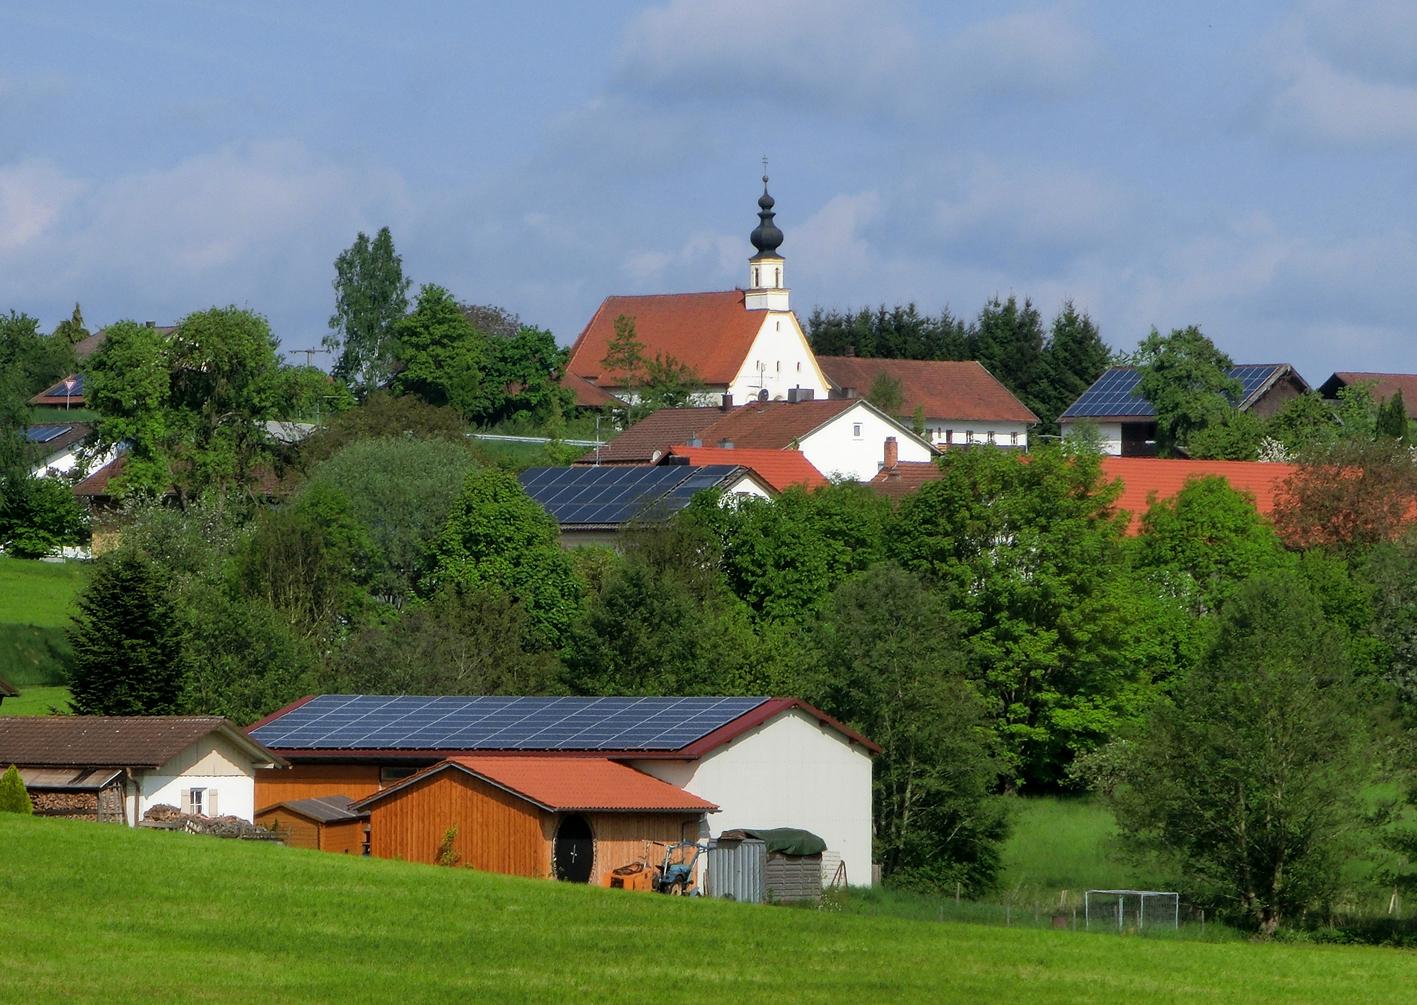 2021 04 26 aoelfb wallfahrtskirche mariae himmelfahrt atzberg5